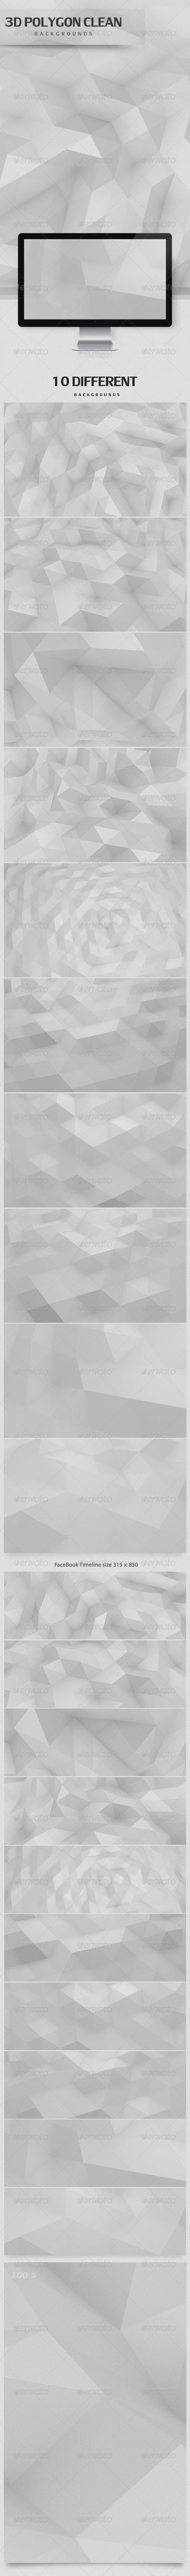 3D Polygon Clean Backgrounds - 3D Backgrounds